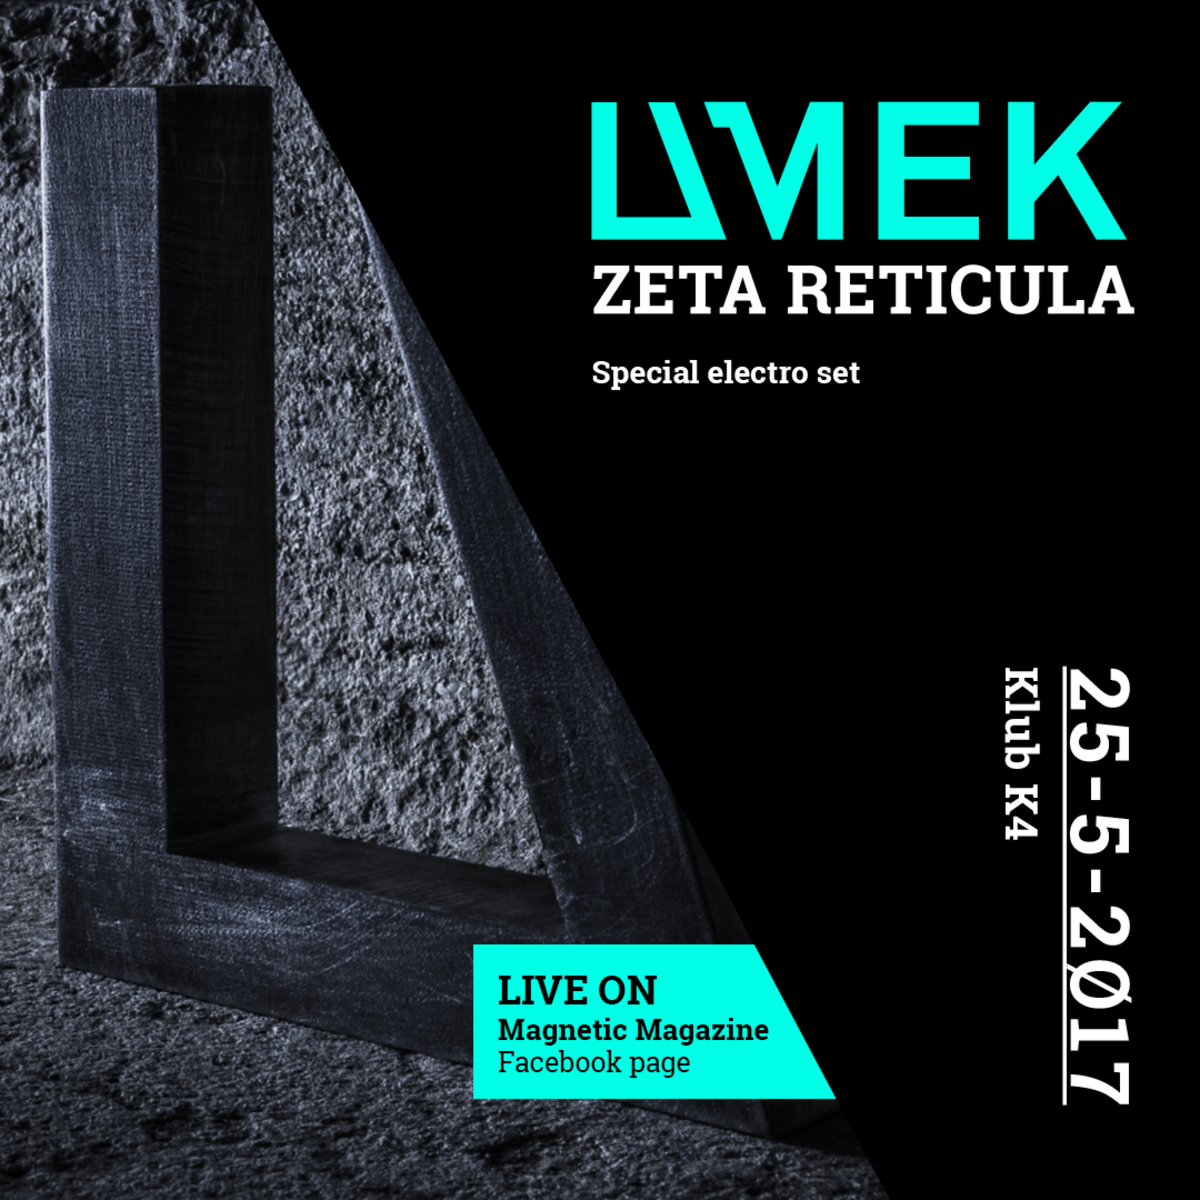 UMEK_ZetaReticula_FB post_MM_1080x1080